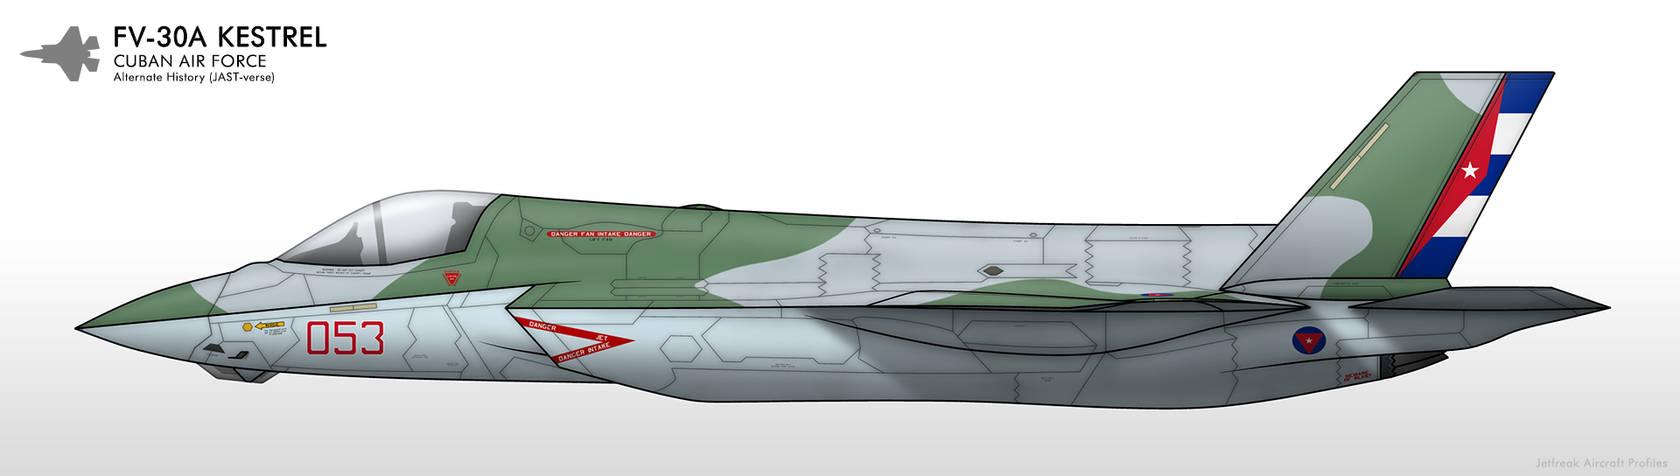 FV-30A - Cuban Air Force